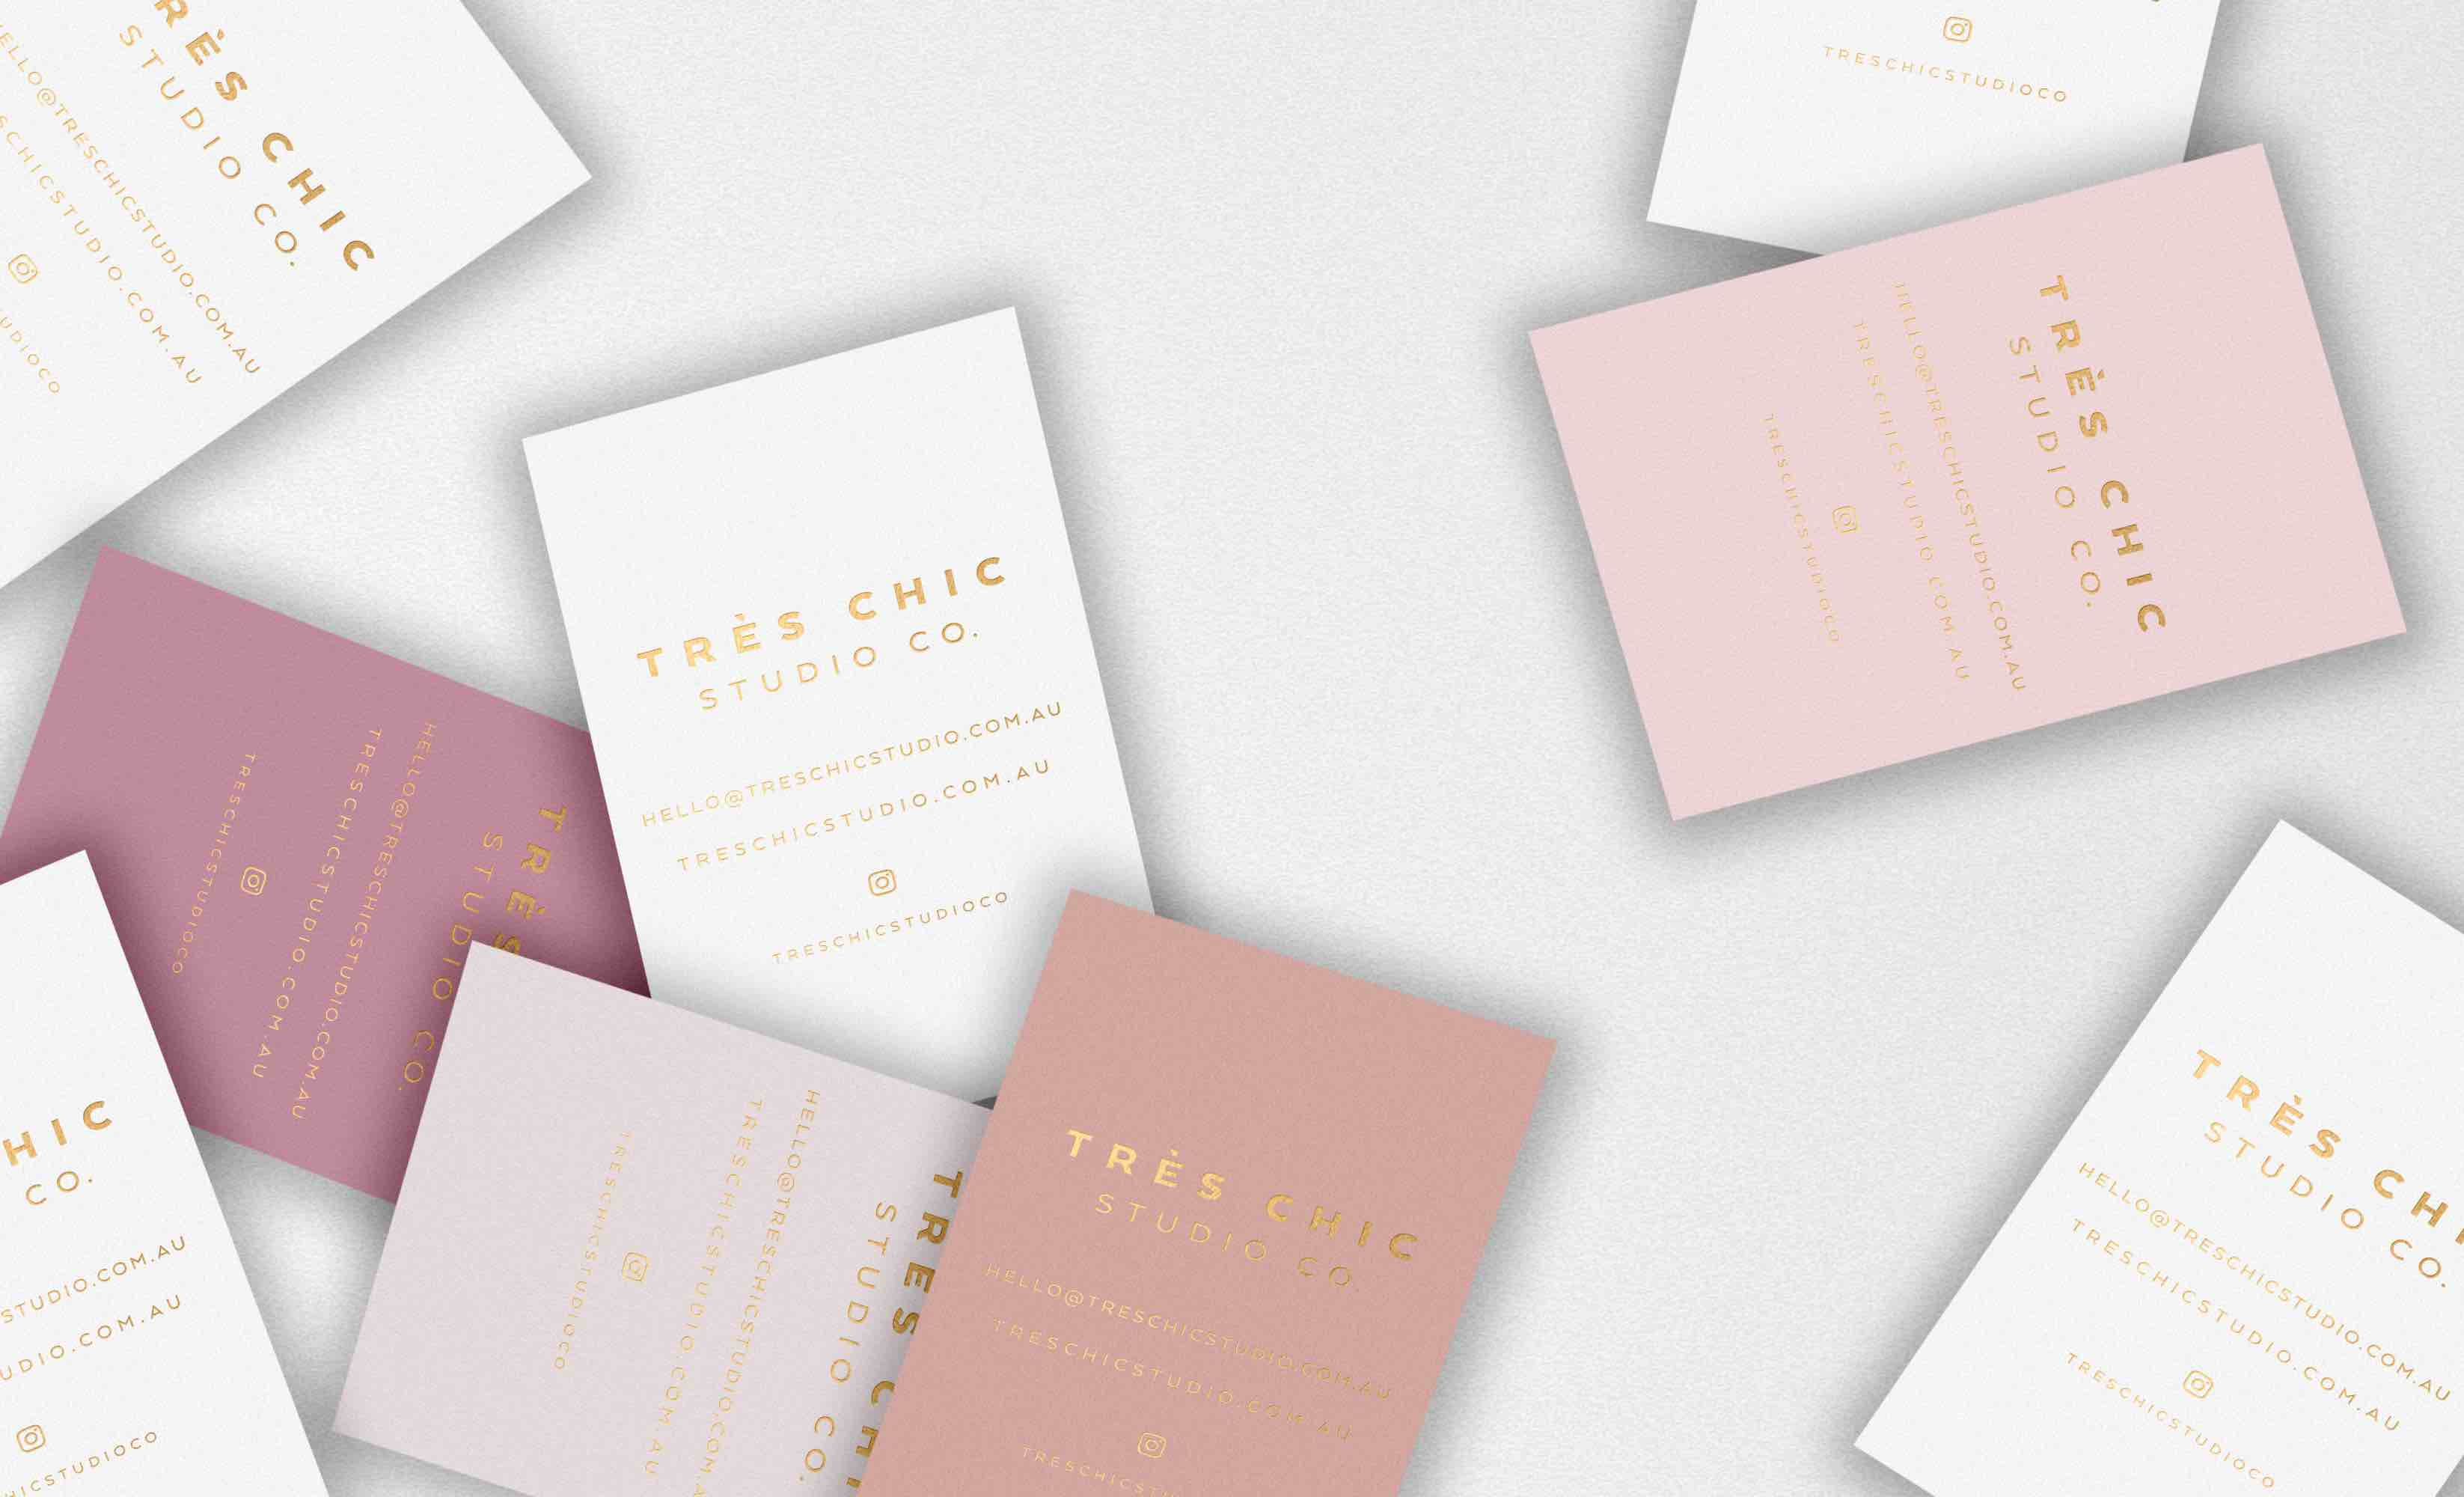 Tres Chic Studio Co   Luxe Premade Branding + Design